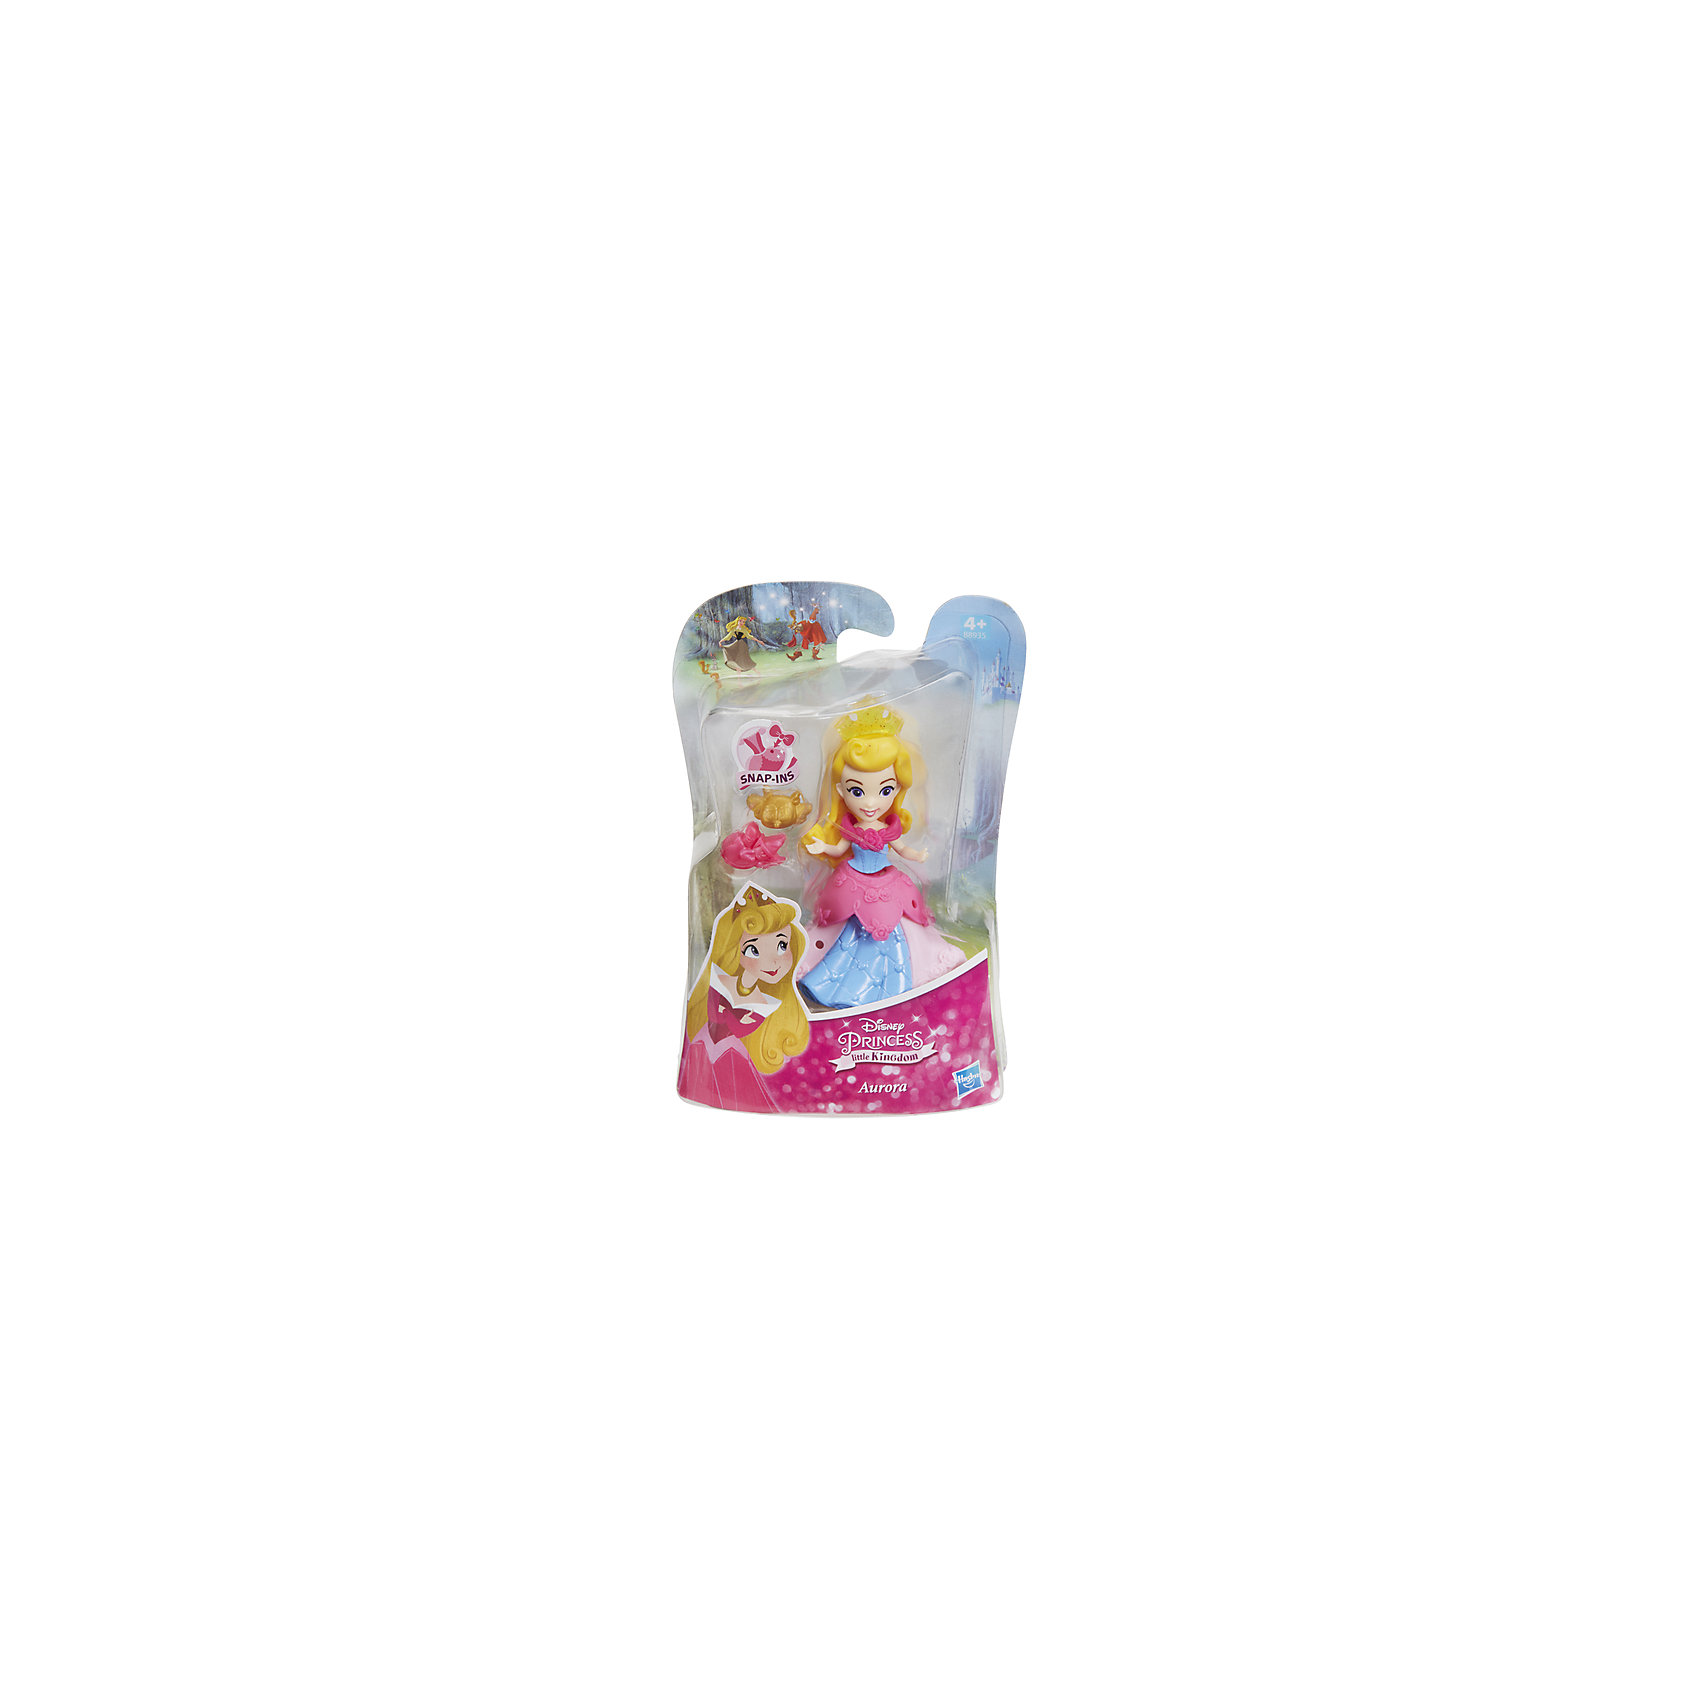 "Мини-кукла Hasbro ""Disney Princess"", Спящая красавица Аврора от myToys"